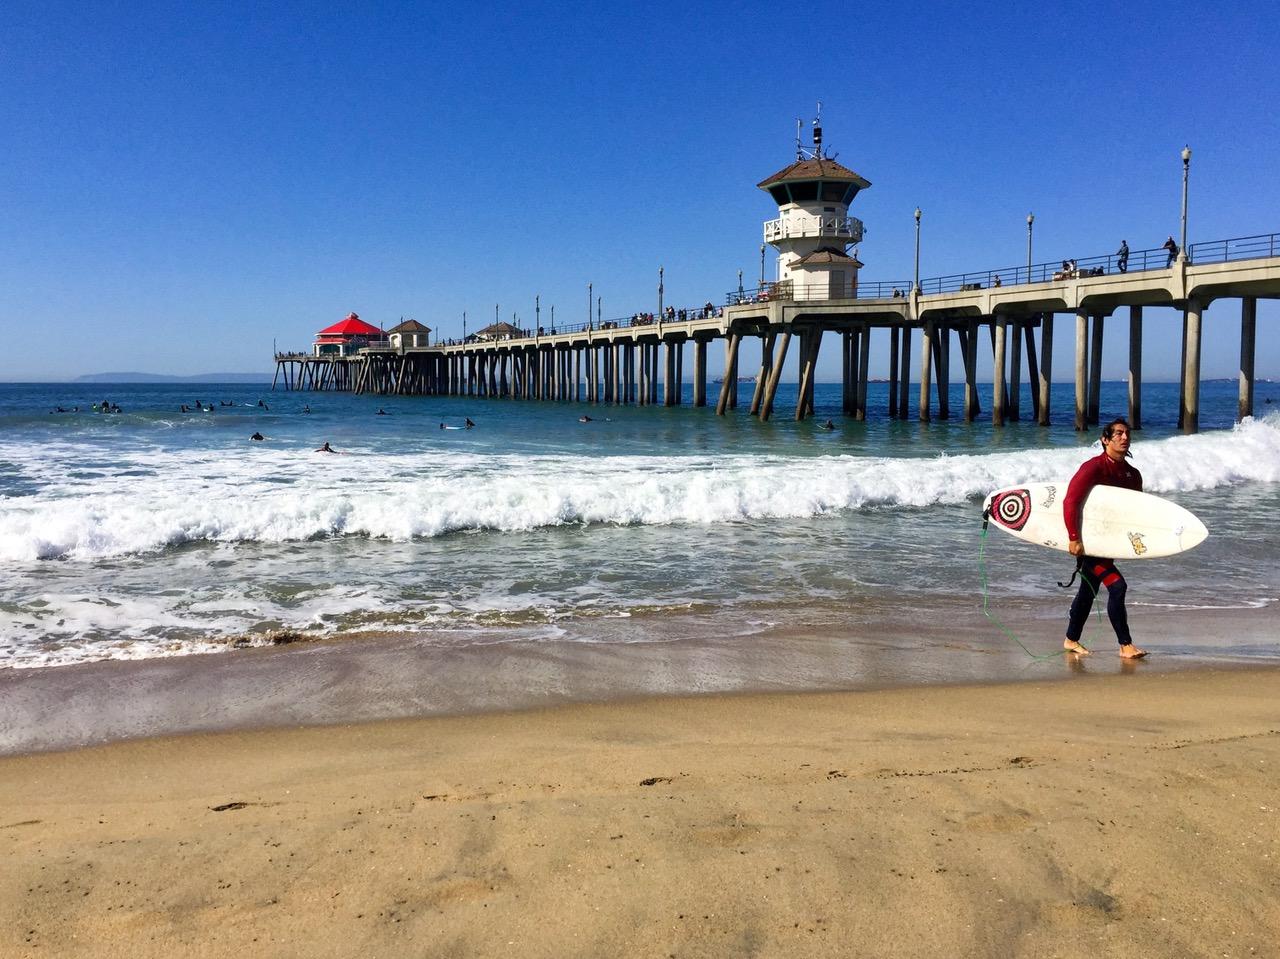 Huntington Beach, Pier, Surf Beaches, USA